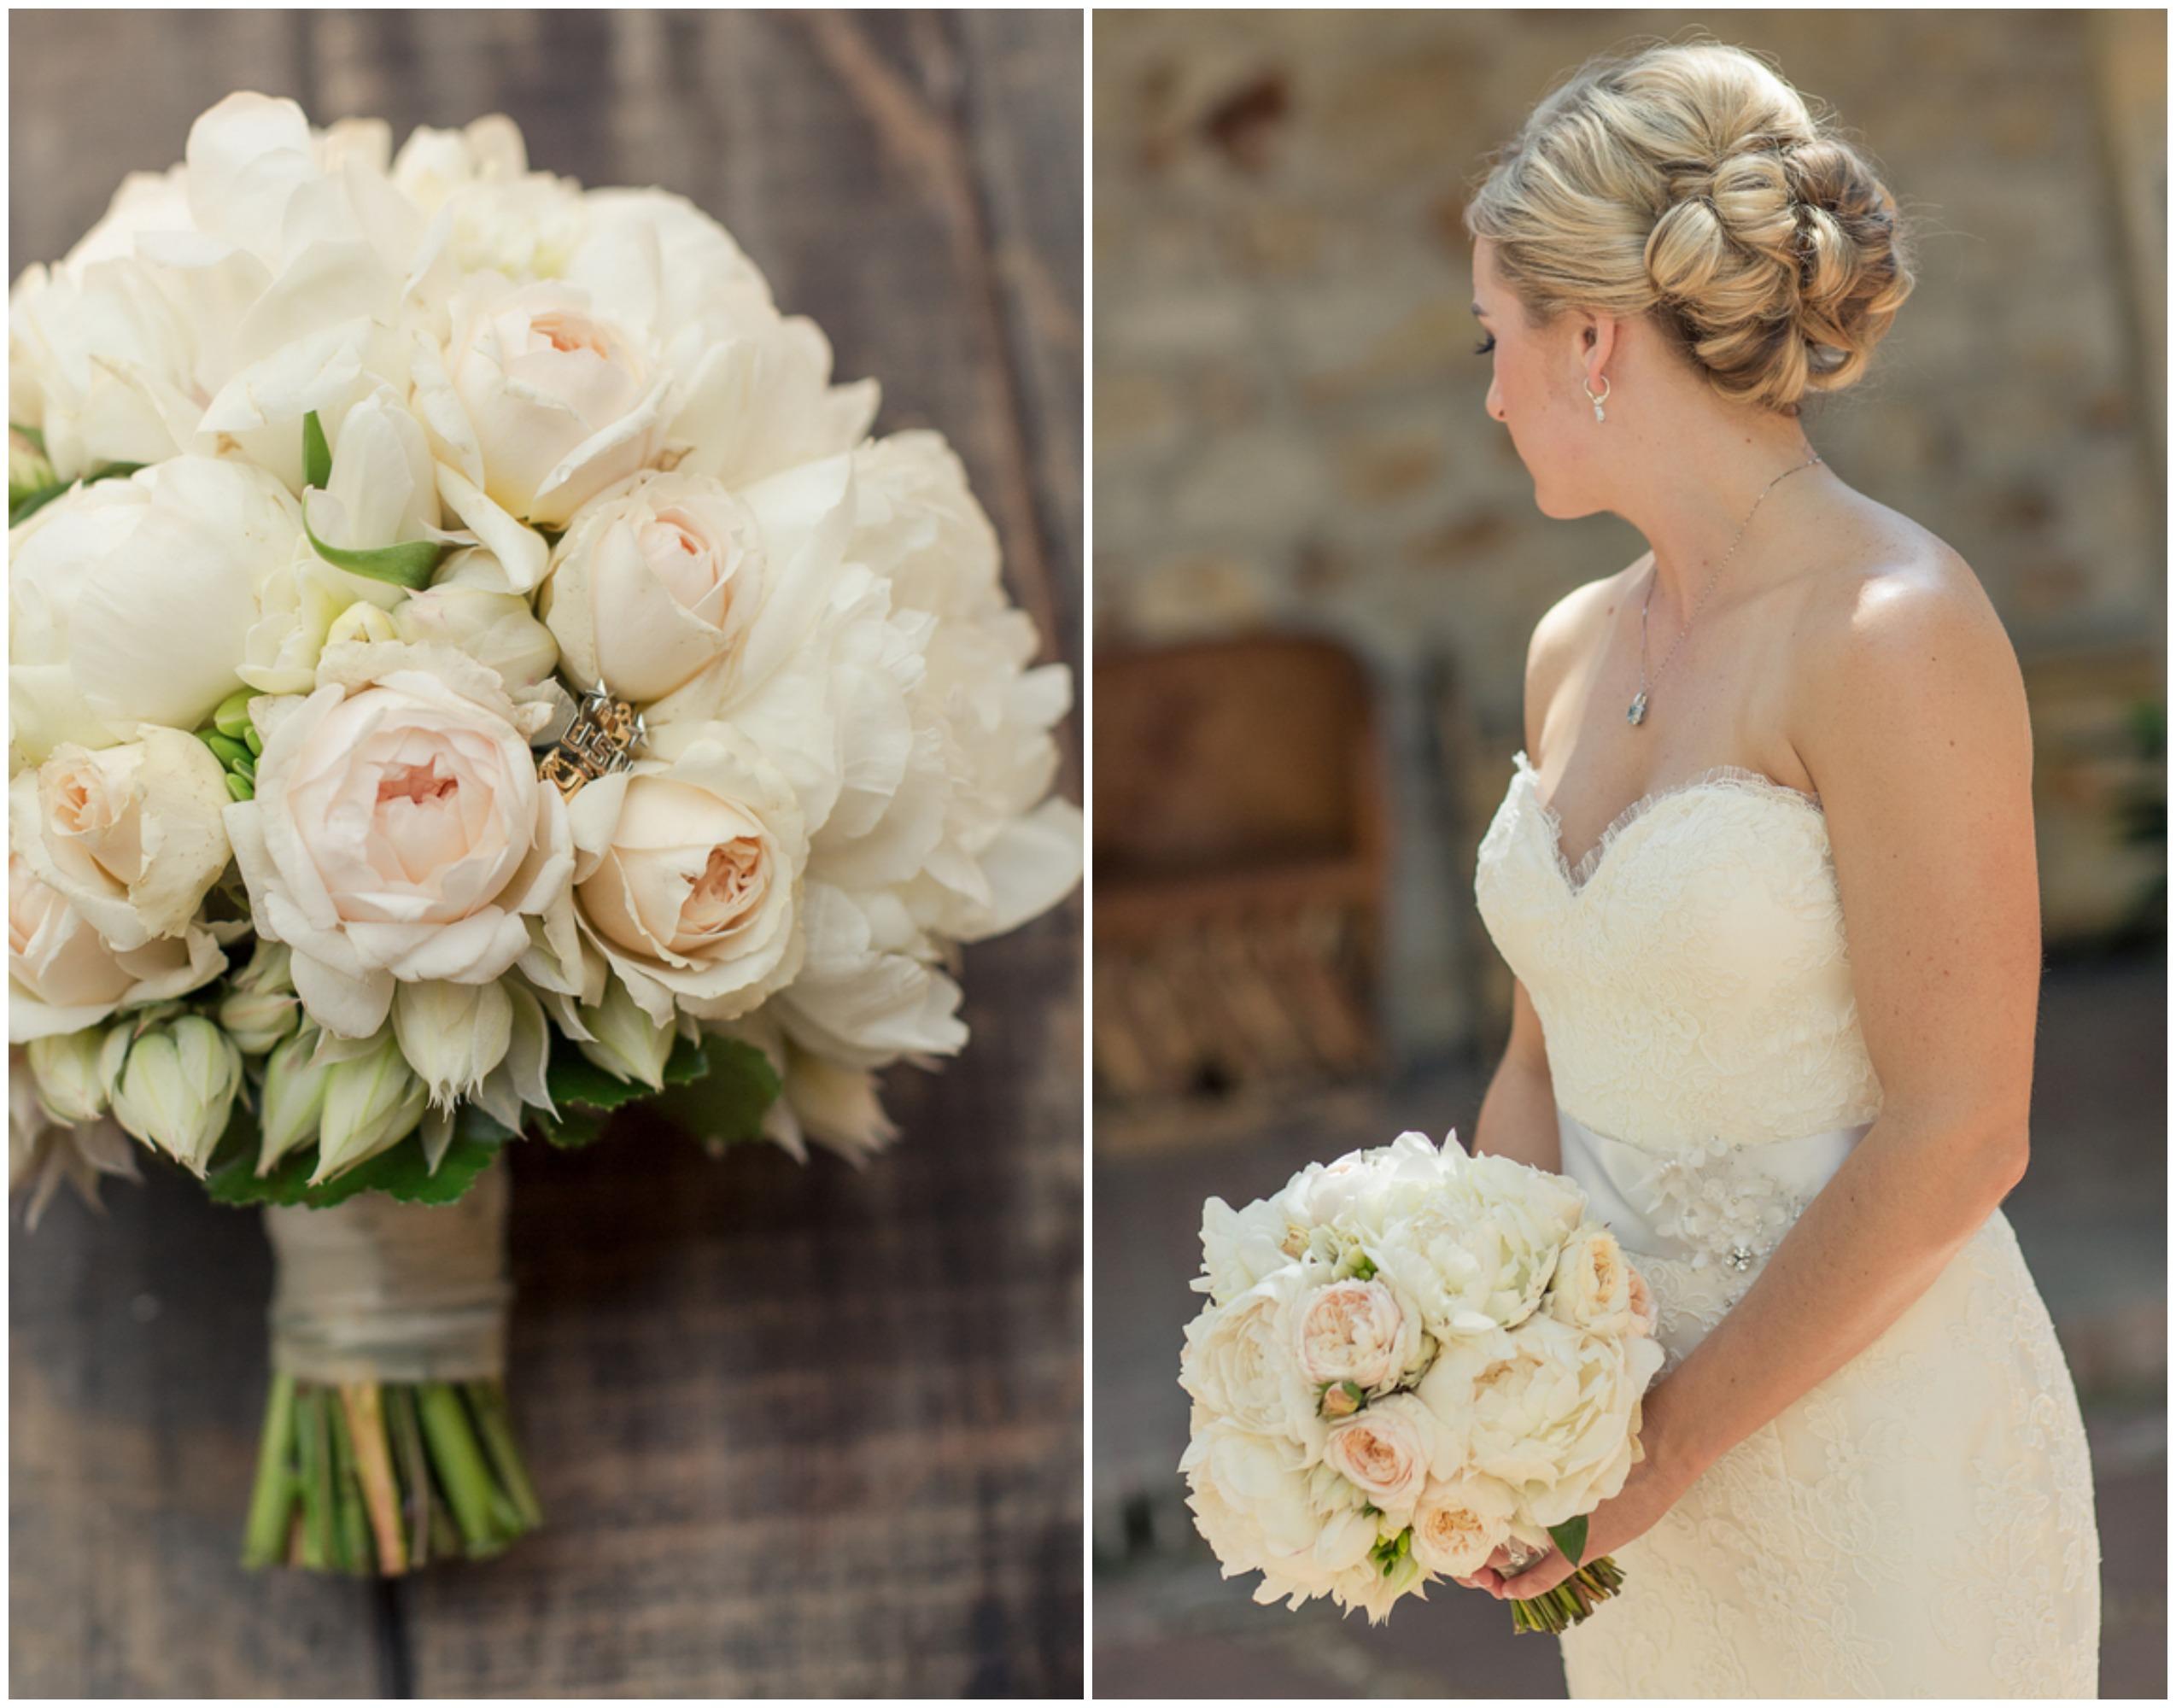 Elegant Wedding Bouquet 2548x2000 Pixels